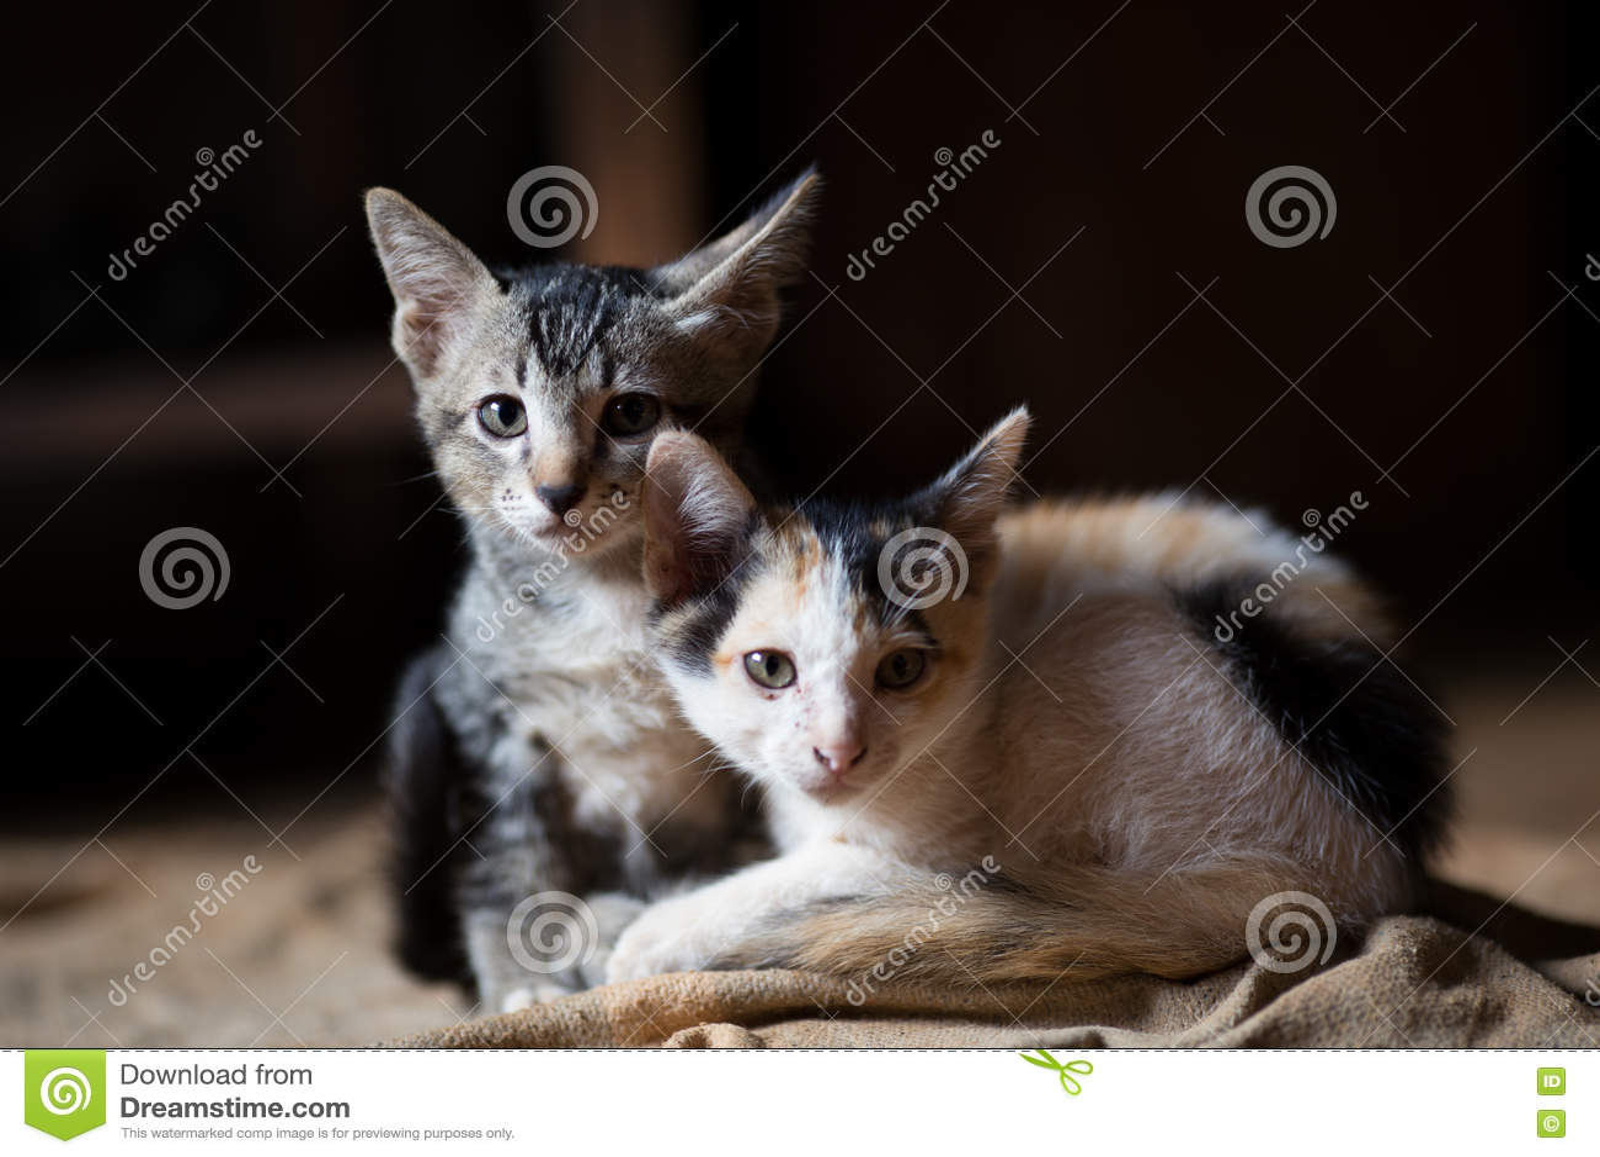 Cat,A little cats,Twins cats